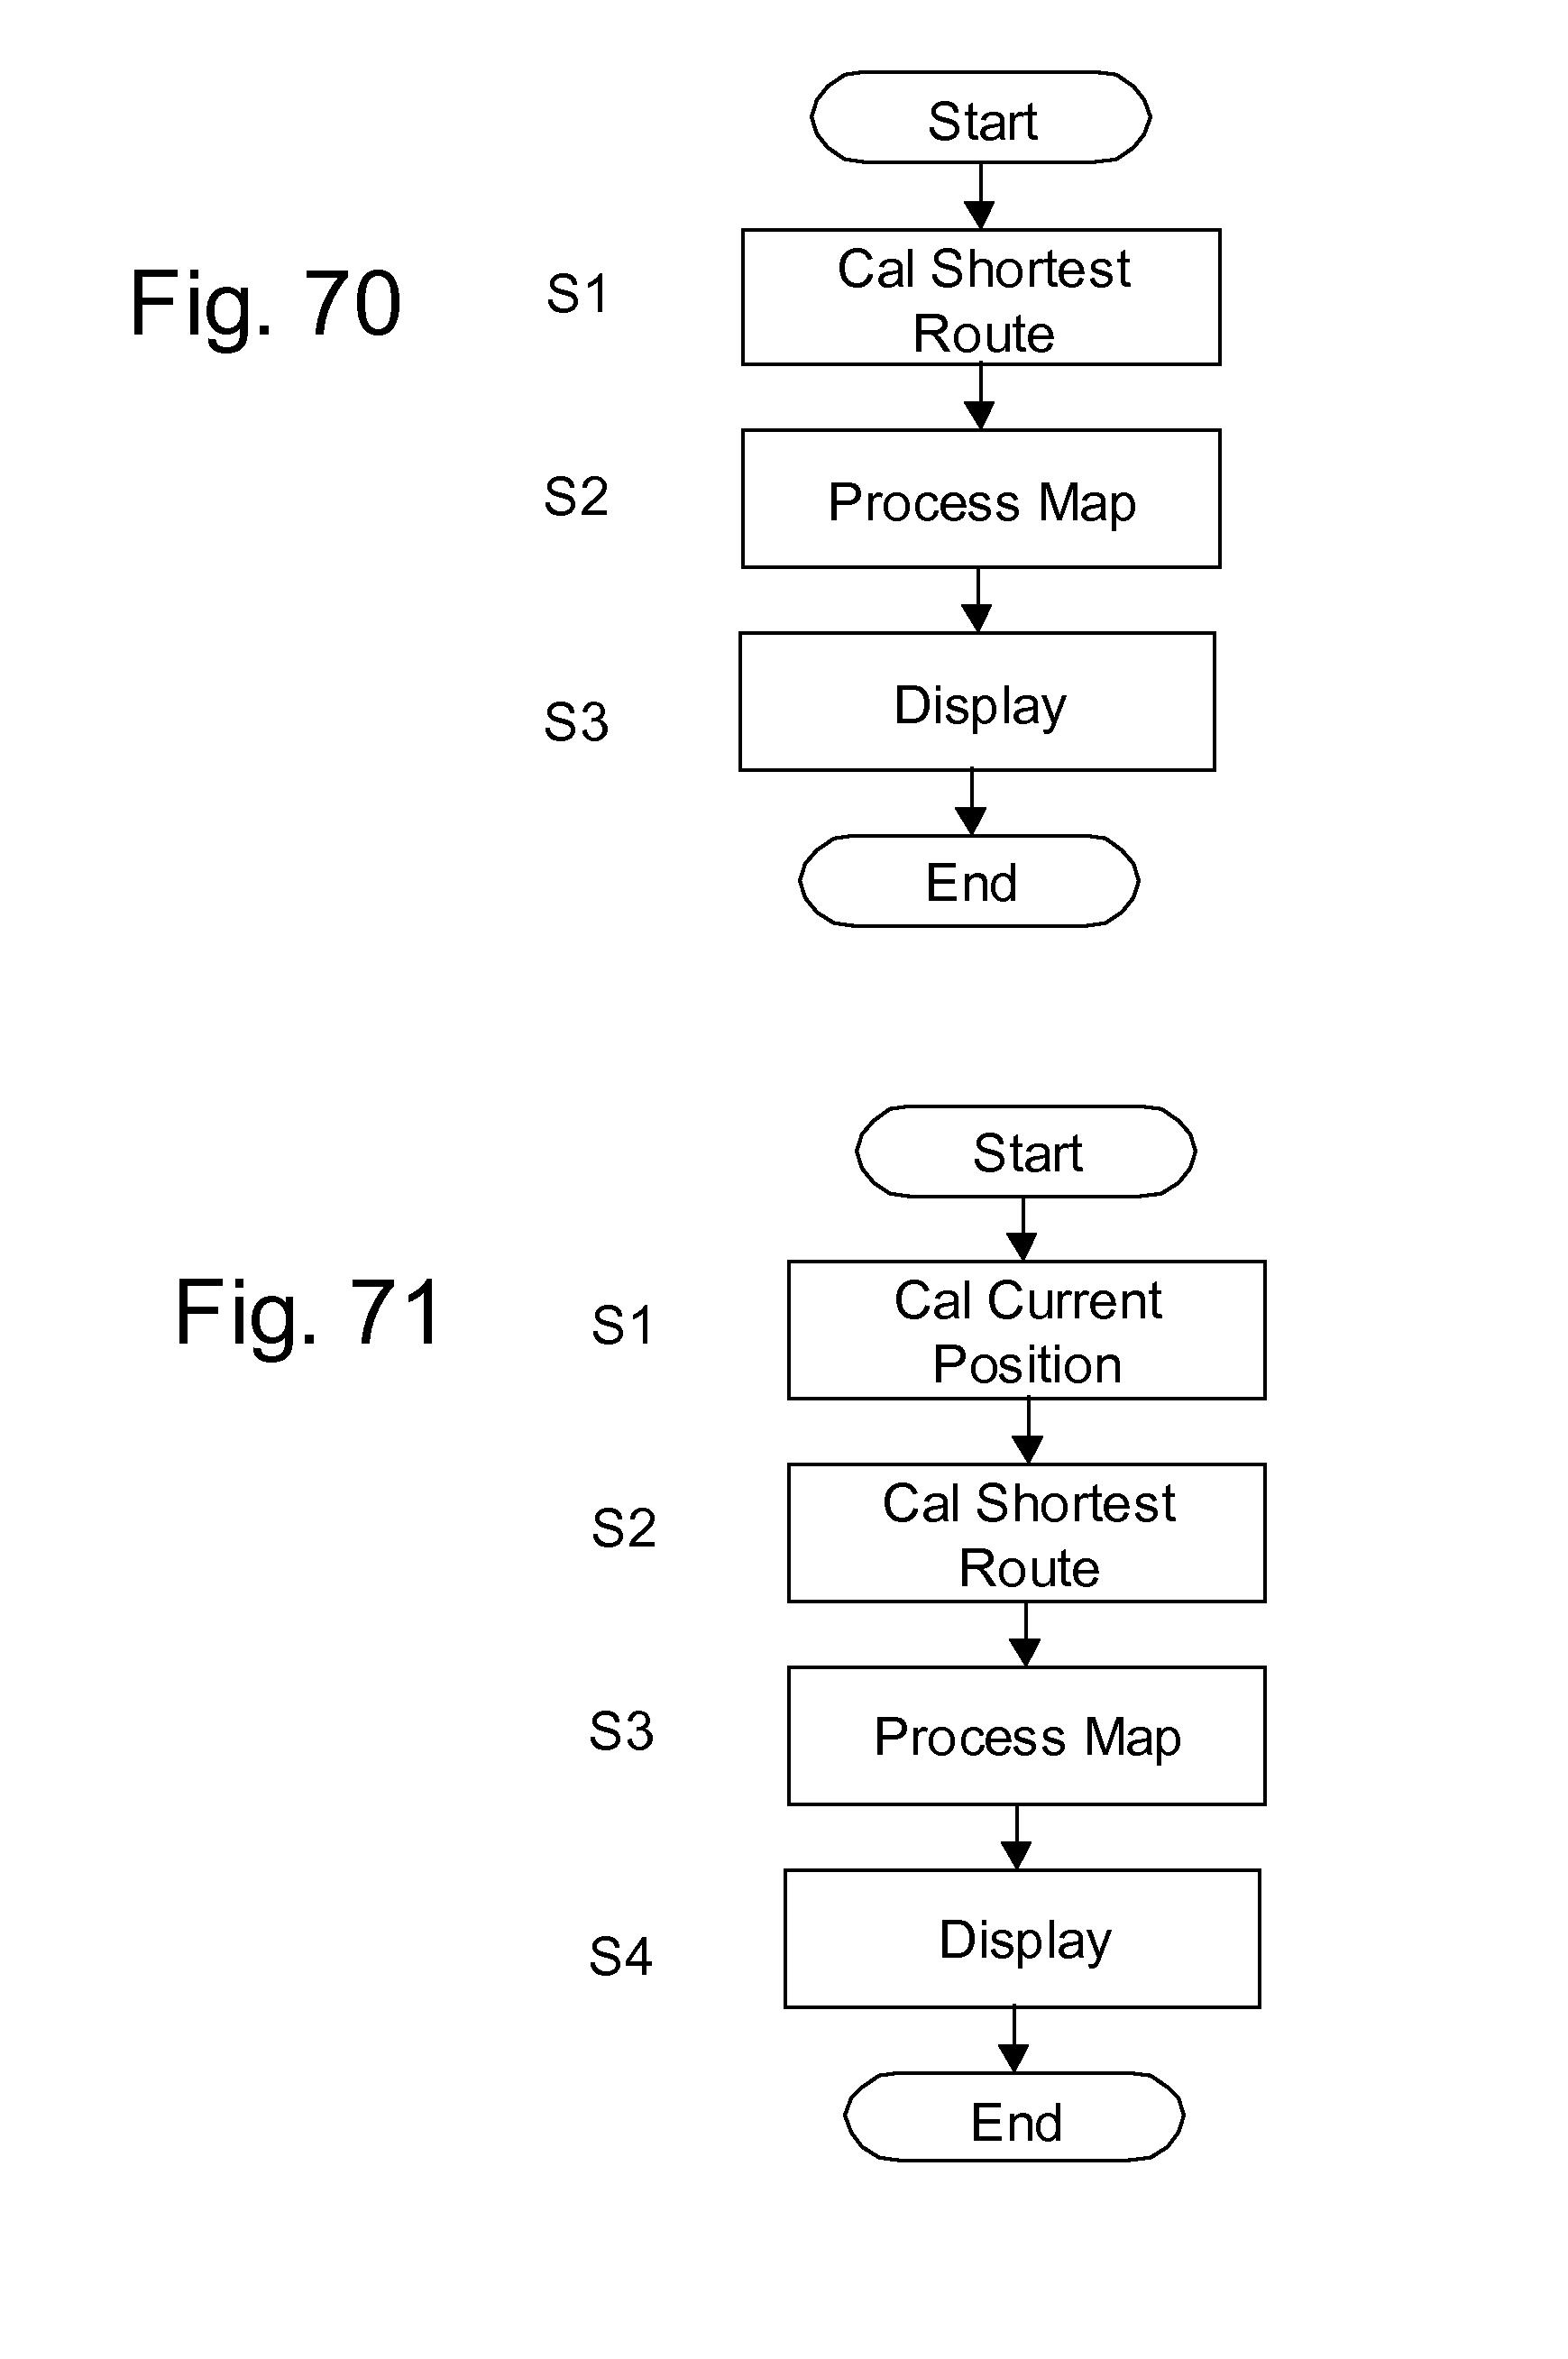 Patent US 7,945,236 B1